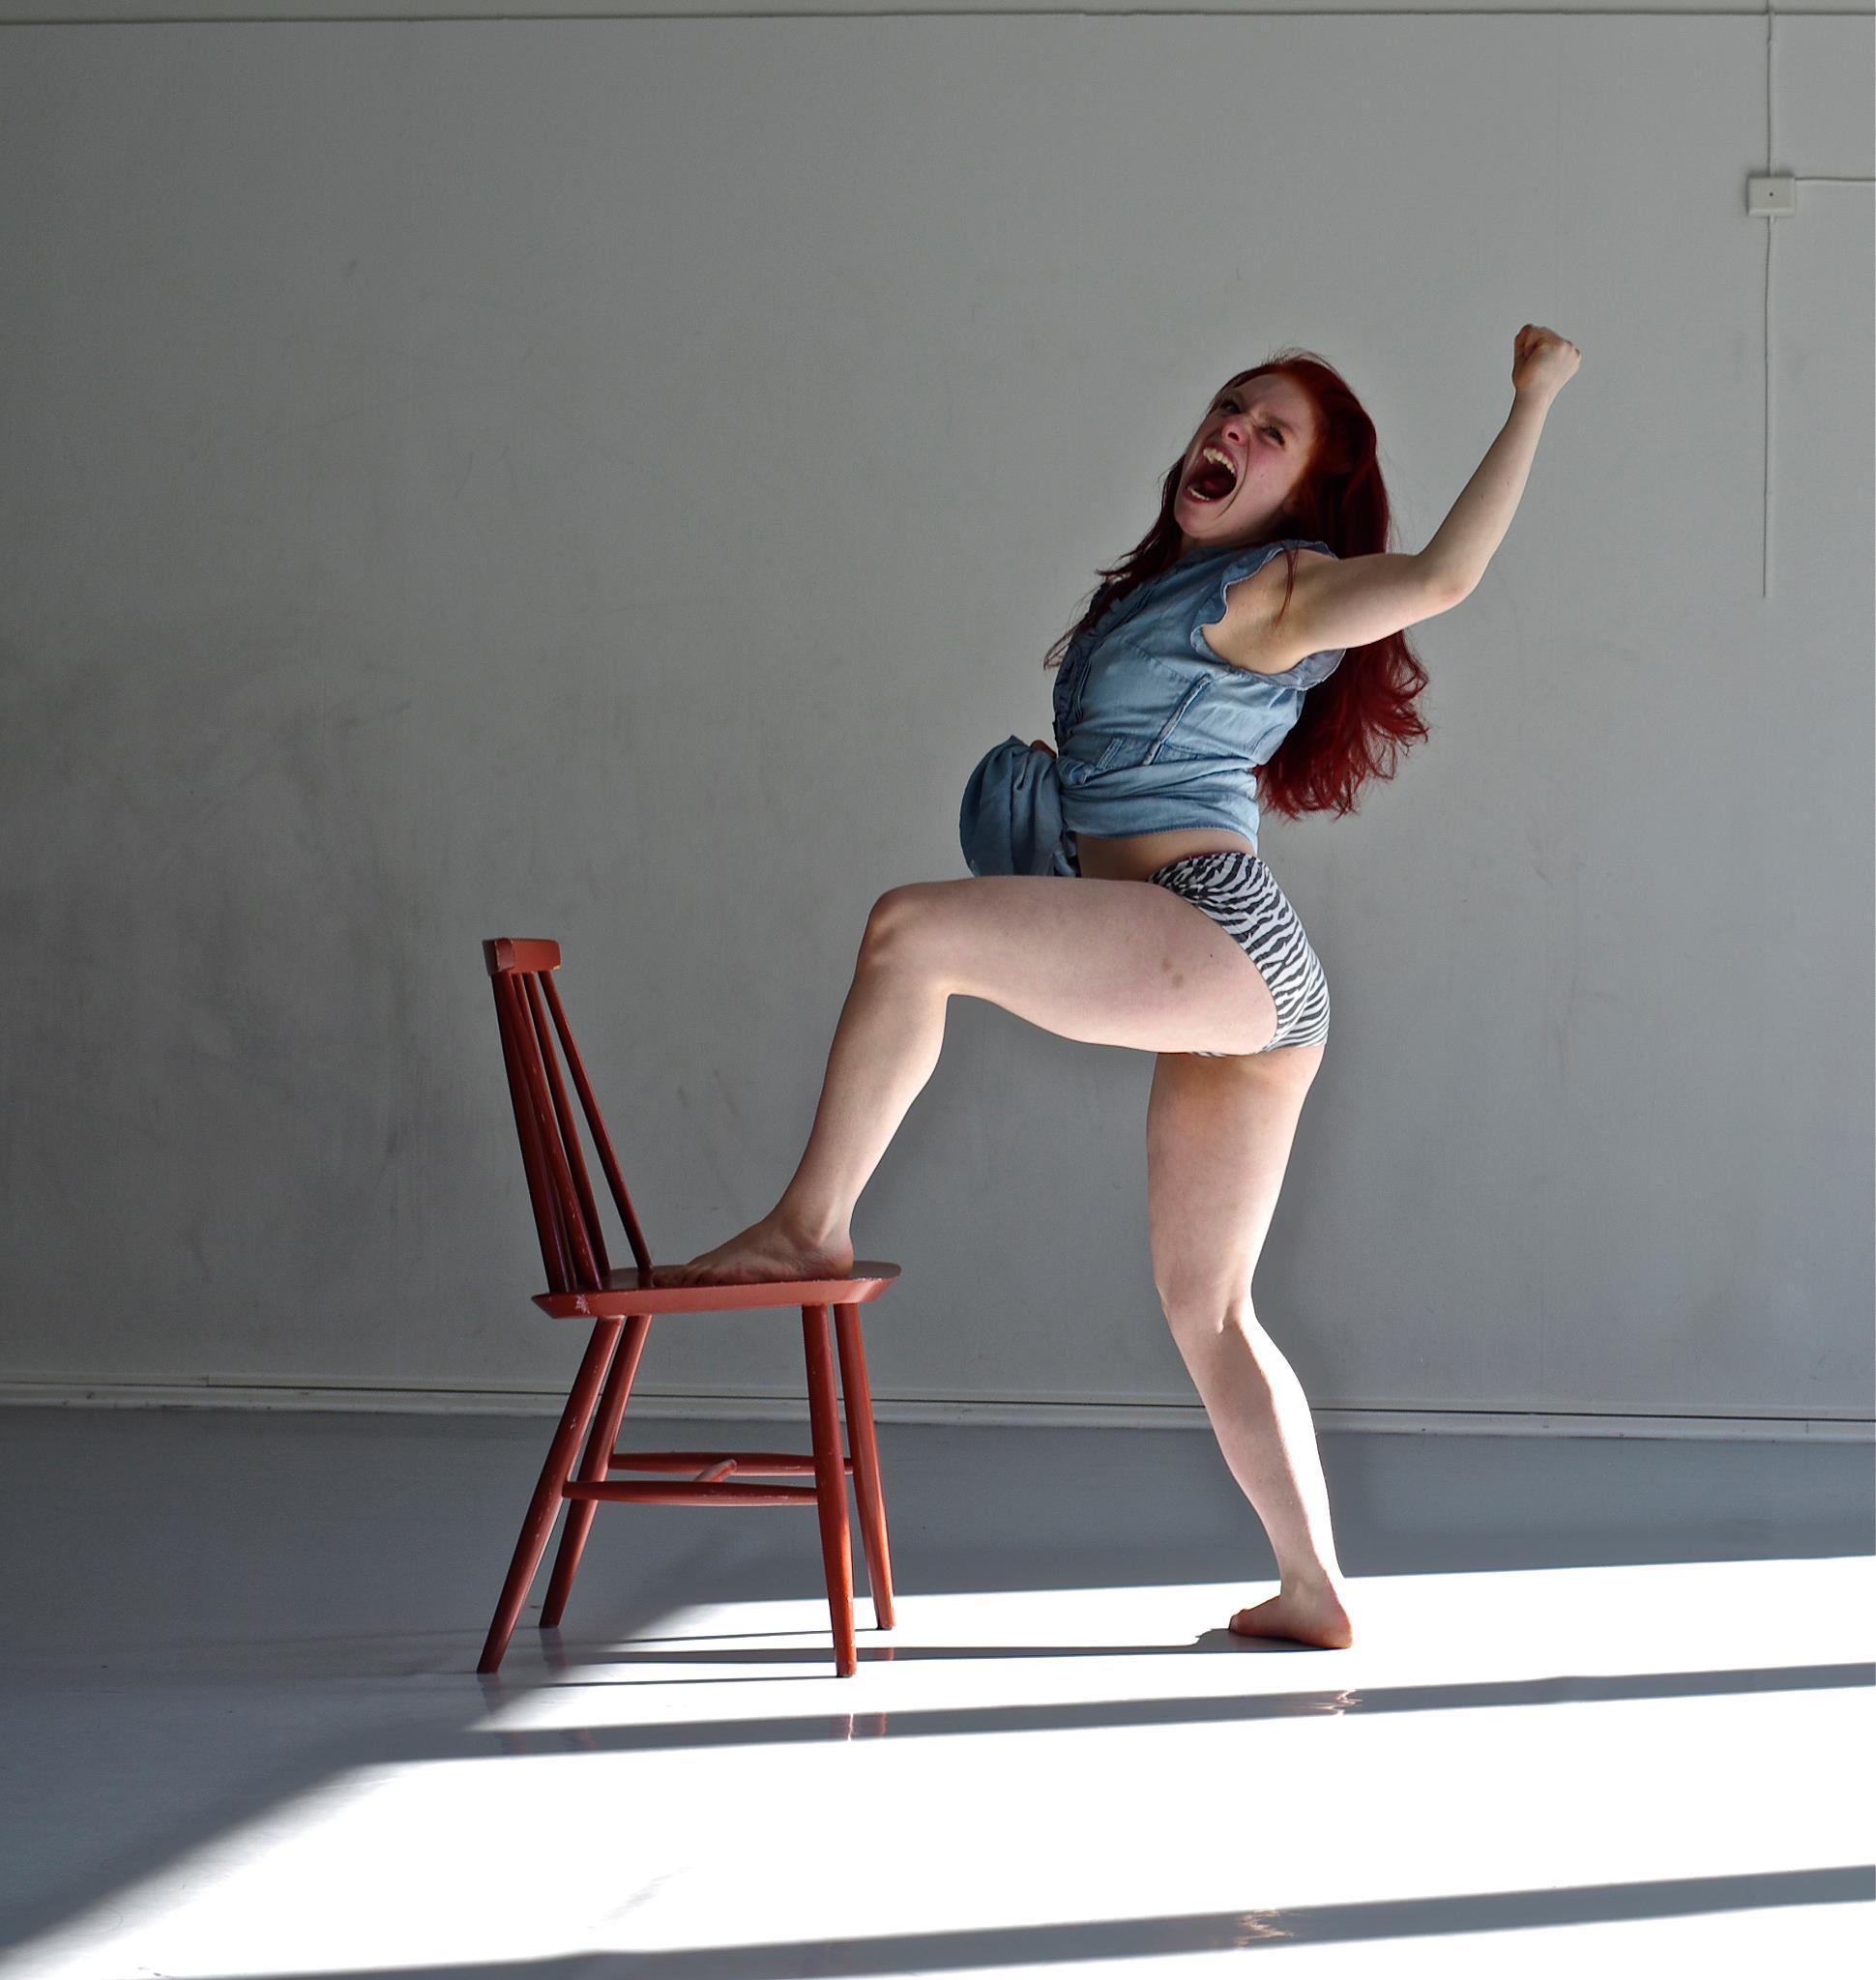 Maya Mi Samuelsen